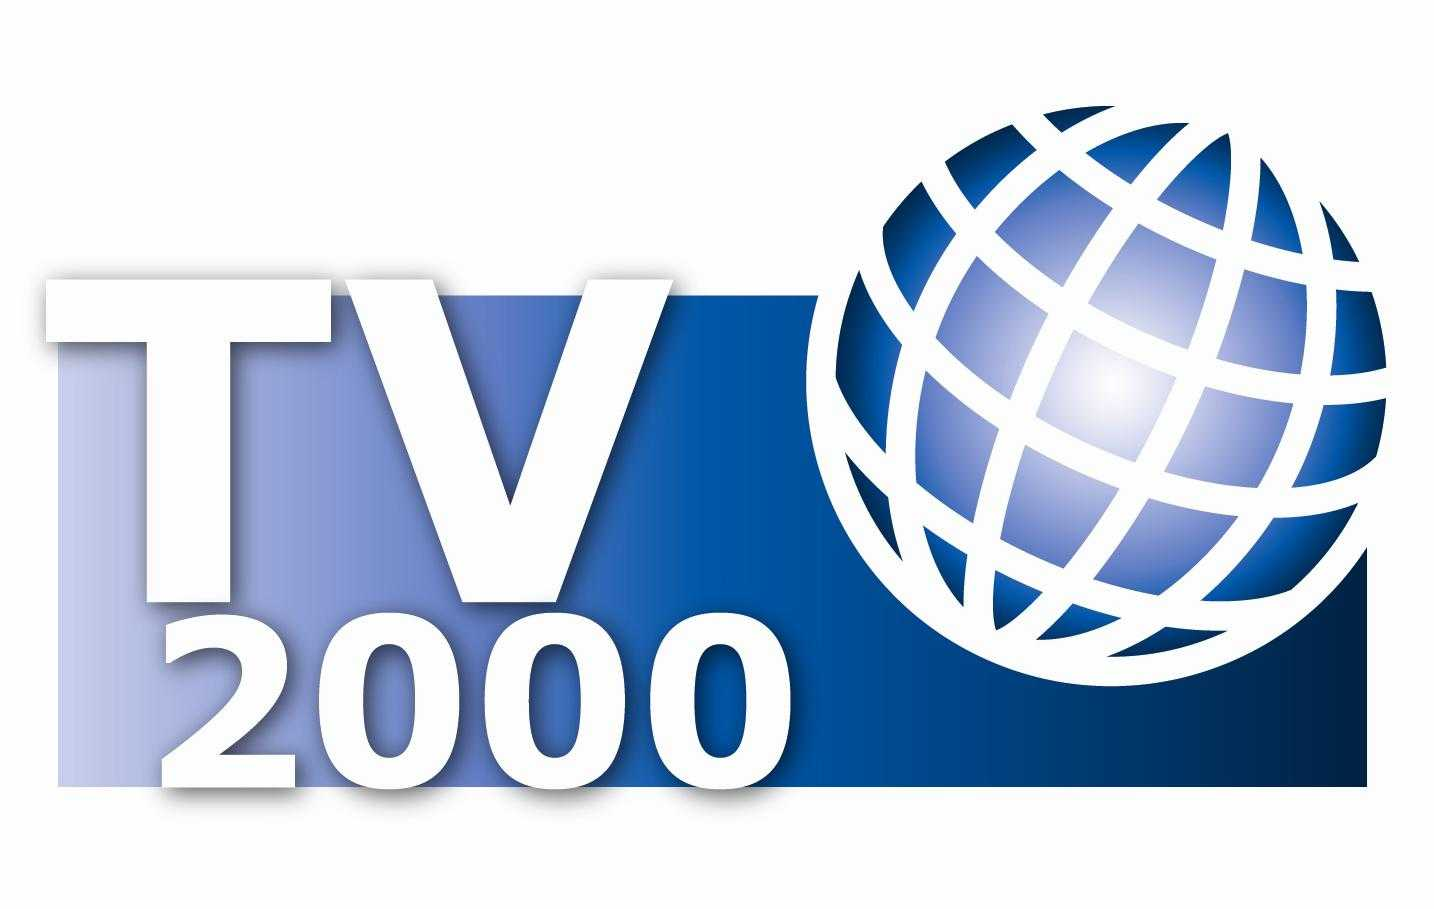 Tv2000: «Insieme nella Settimana Santa»   Digitale terrestre: Dtti.it